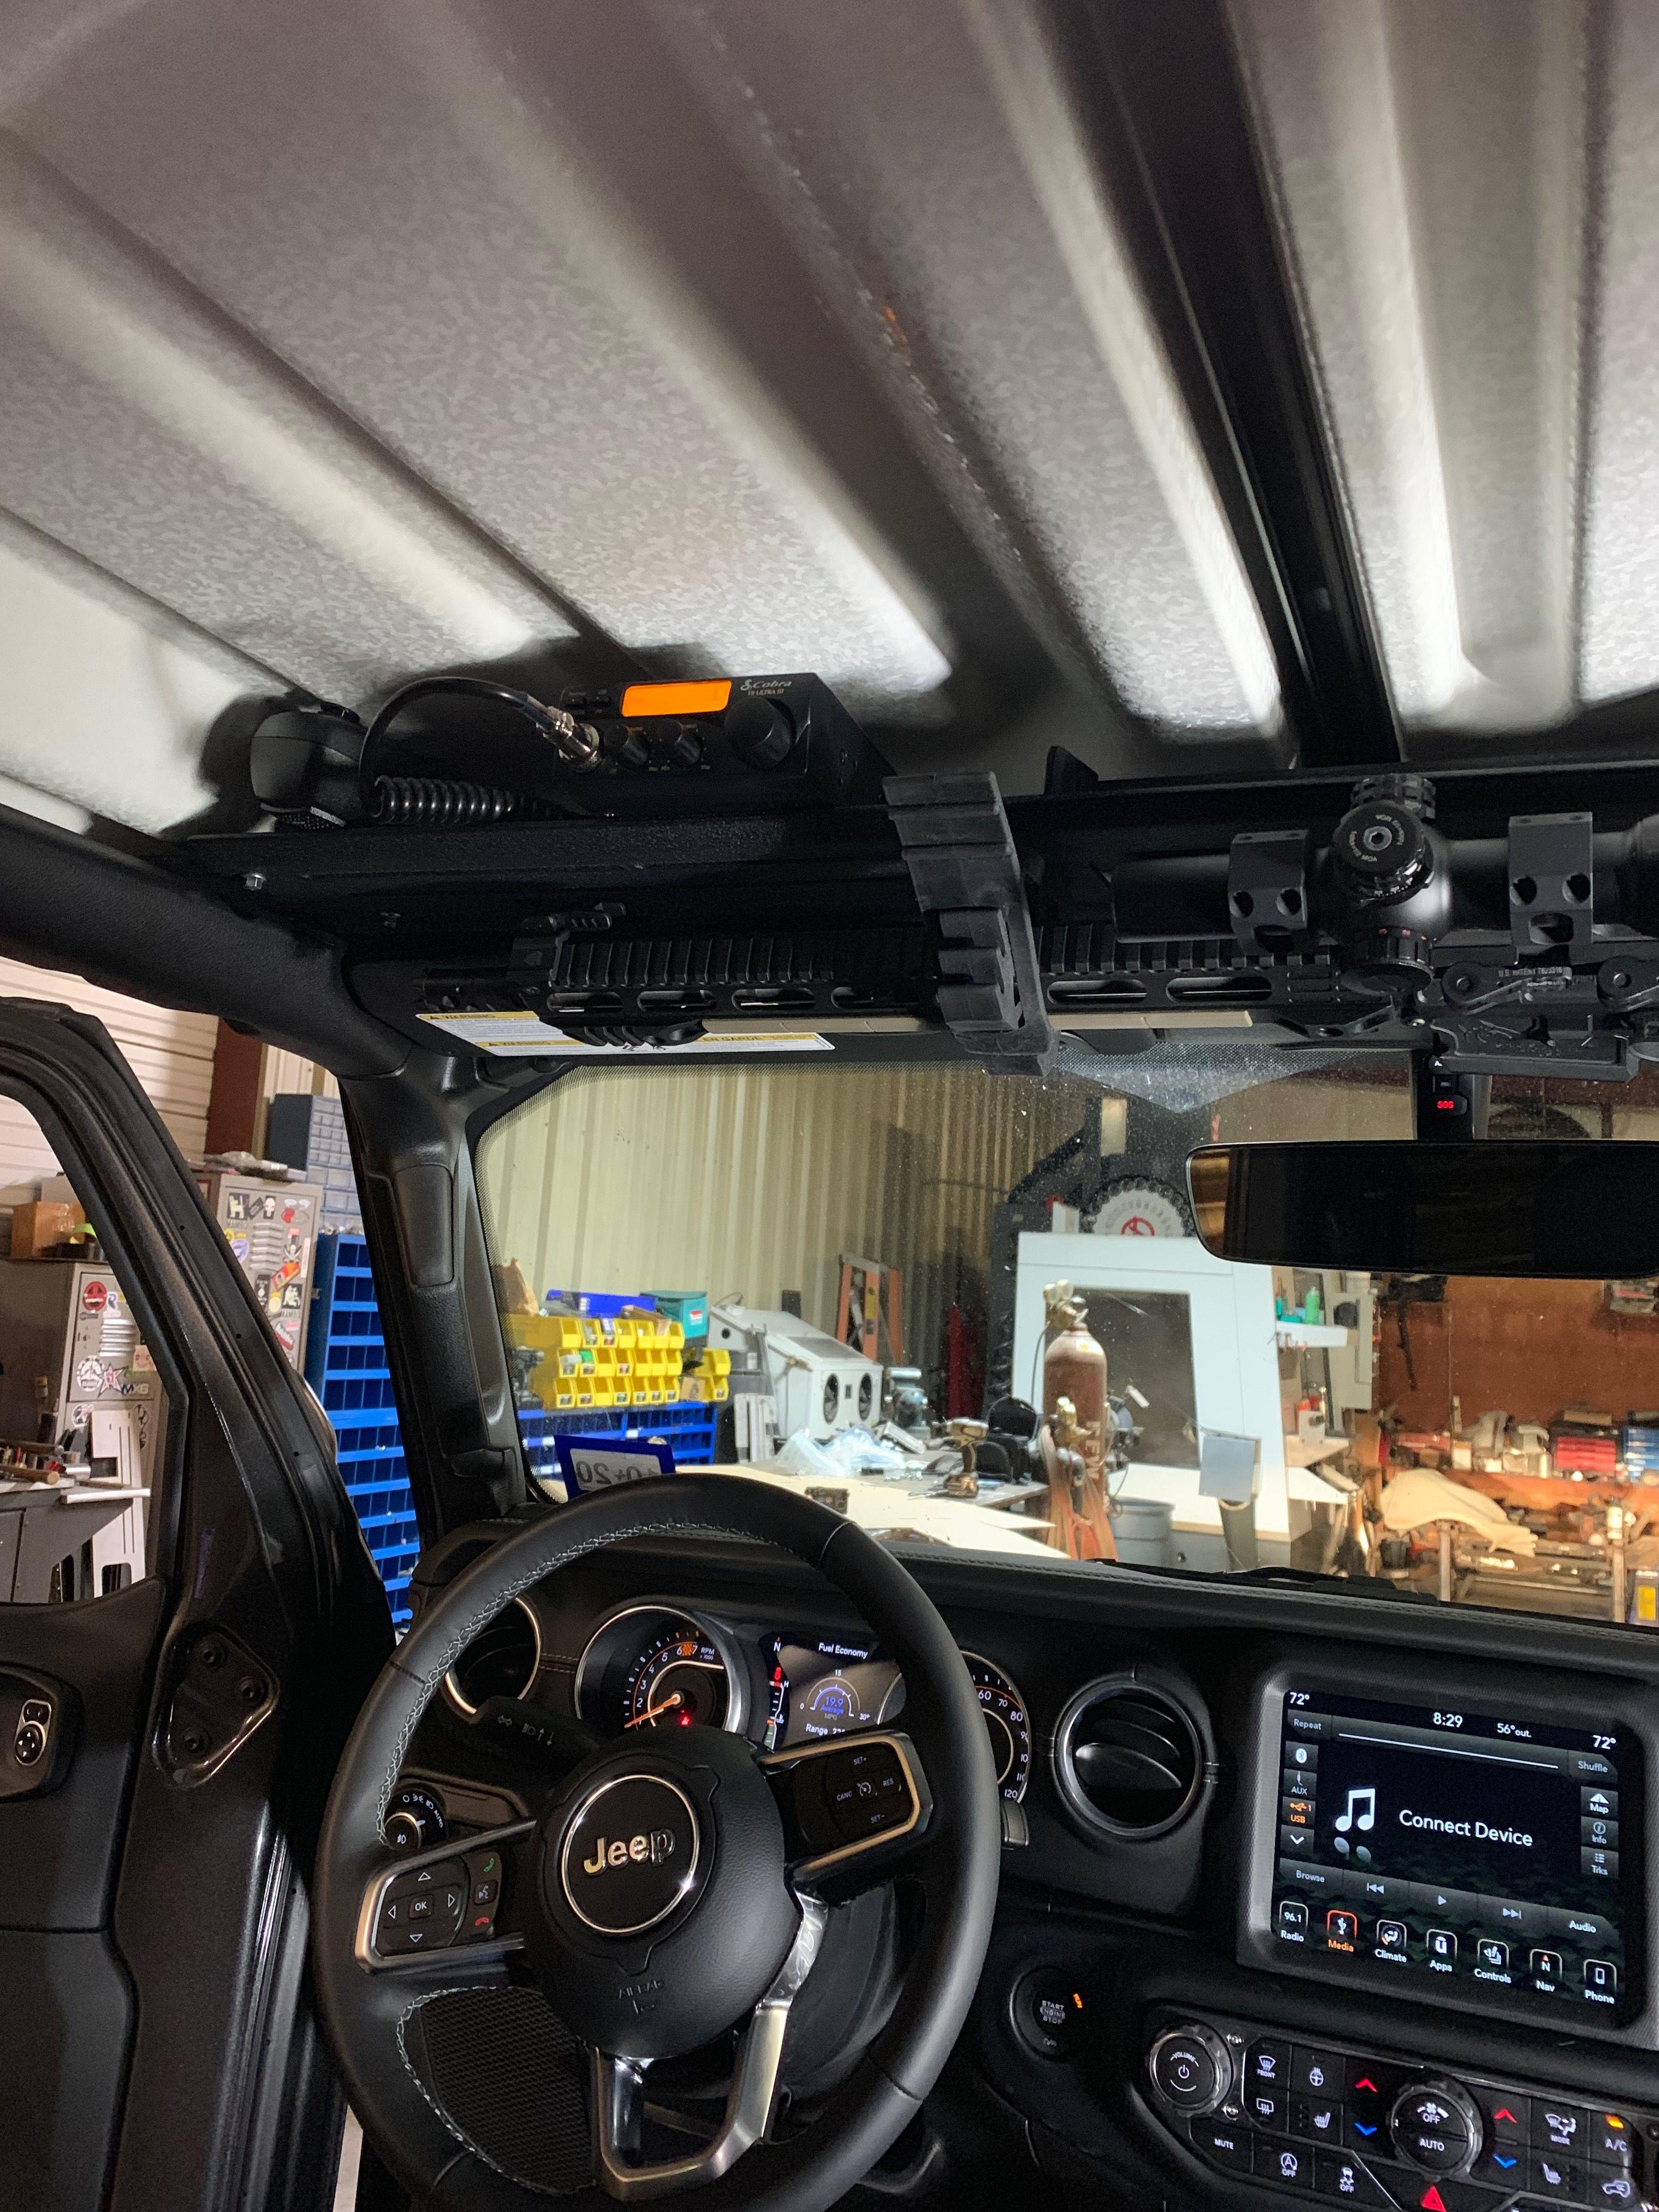 Jl Jeep Overhead Mount Overland Truck Jeep Overlanding